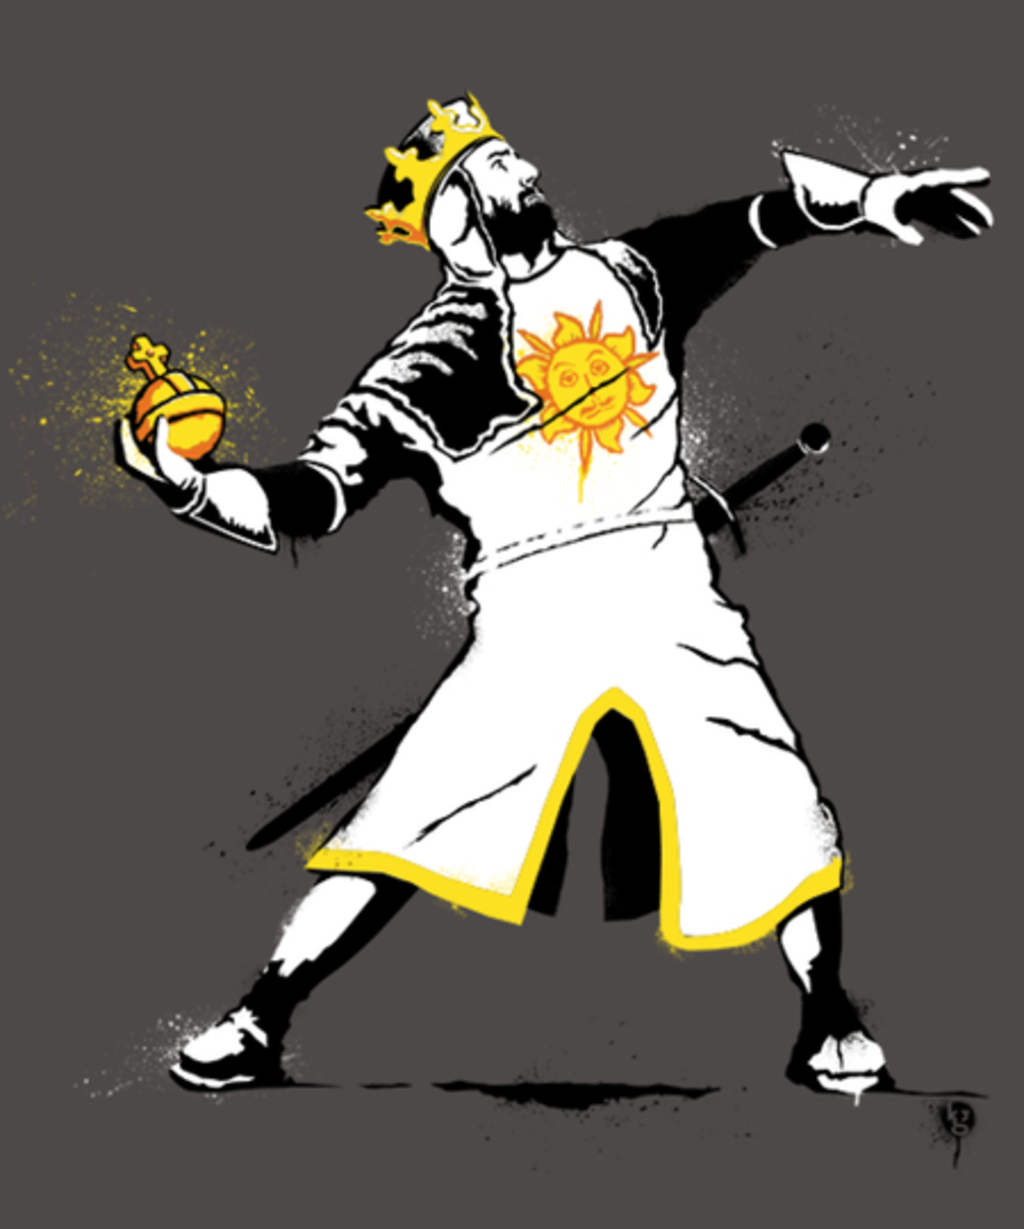 Qwertee: Banksy Python 1-2-5